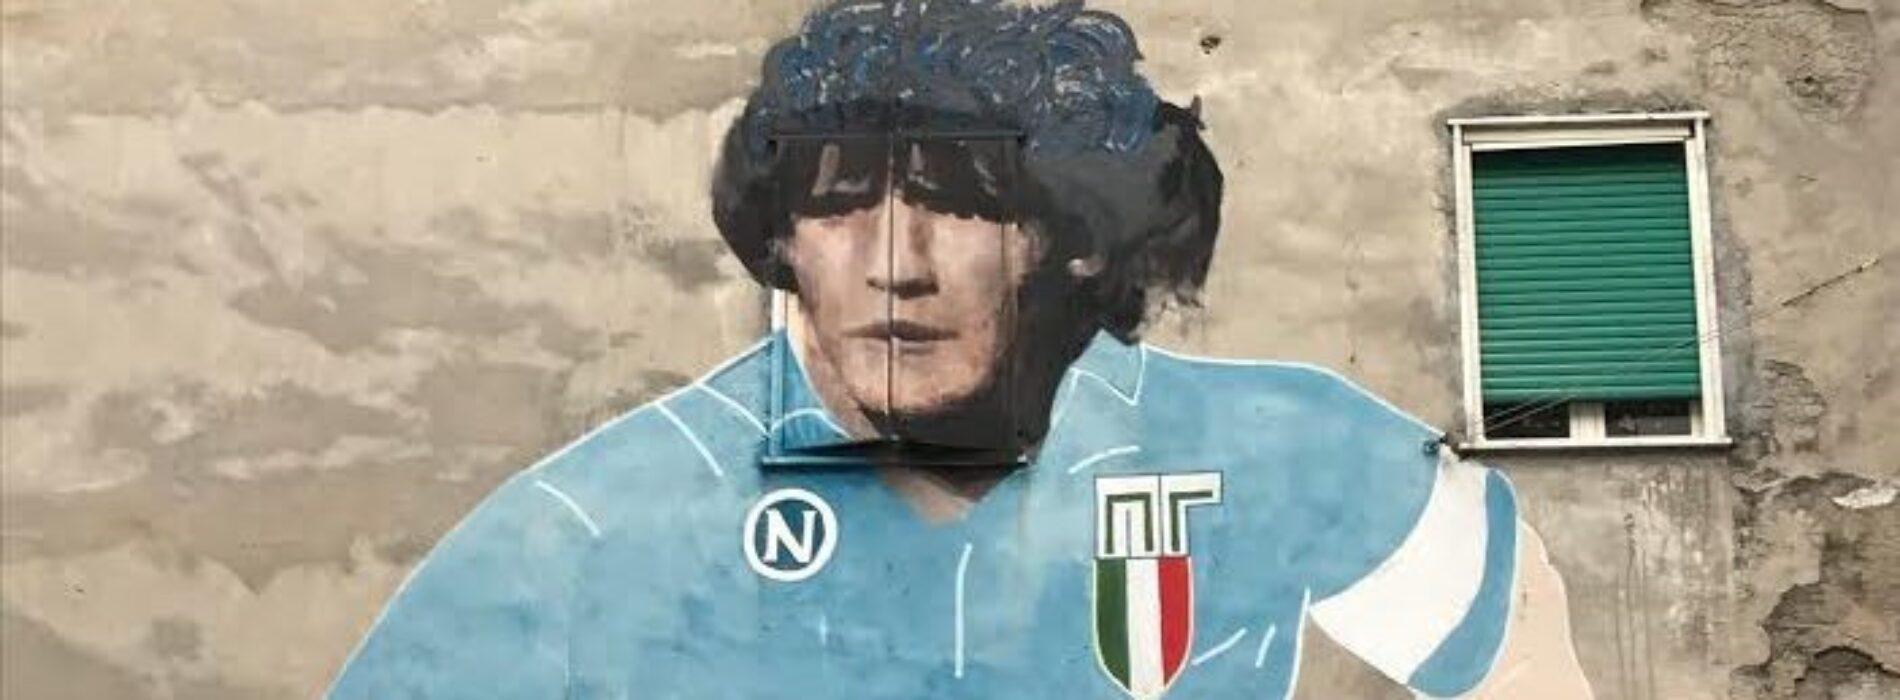 Maradona e le sue città. Buenos Aires, Barcellona e Napoli